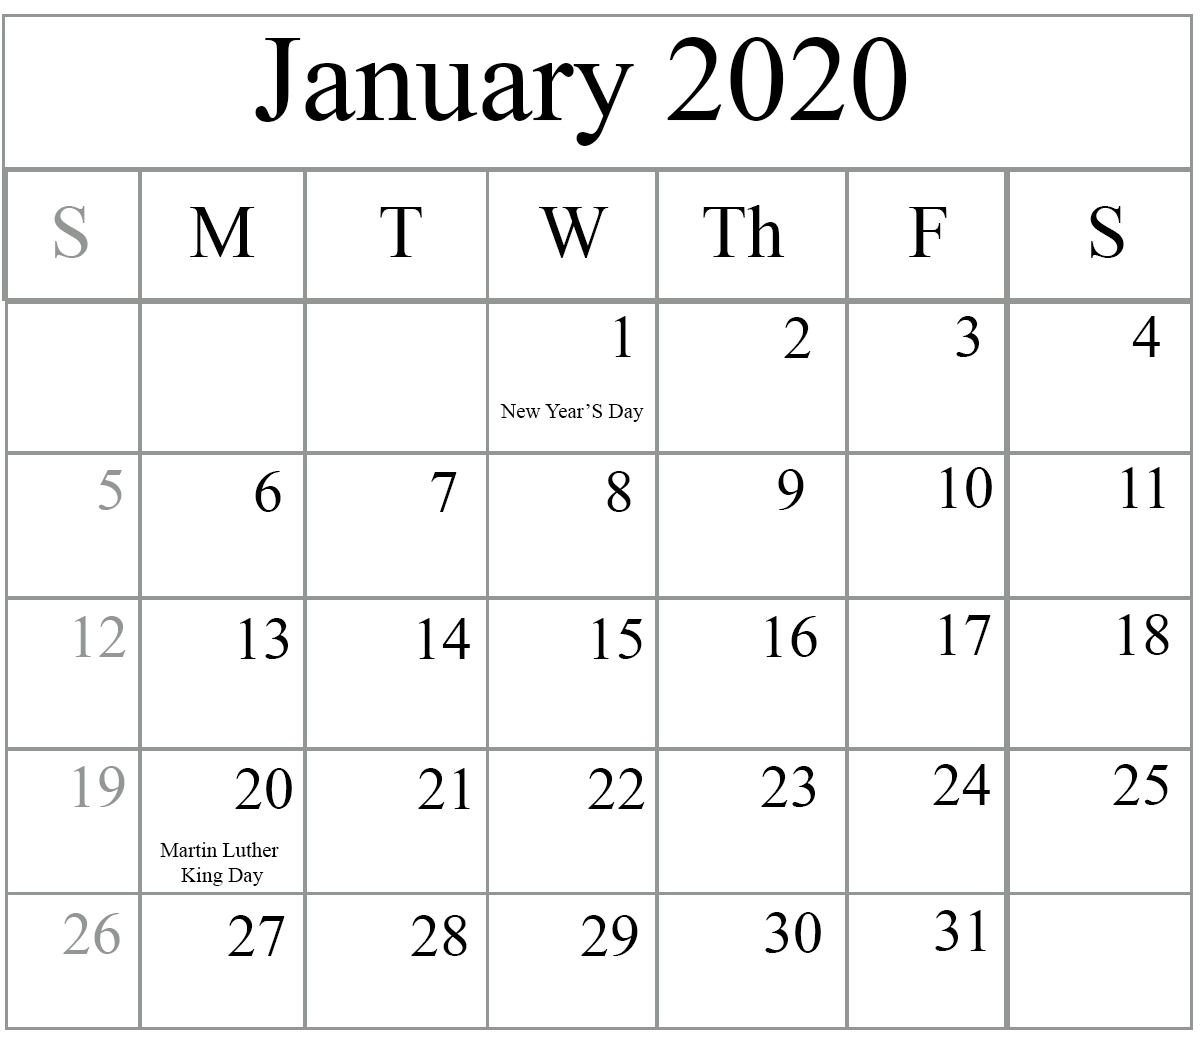 January 2020 Printable Calendar | Printable March Calendar